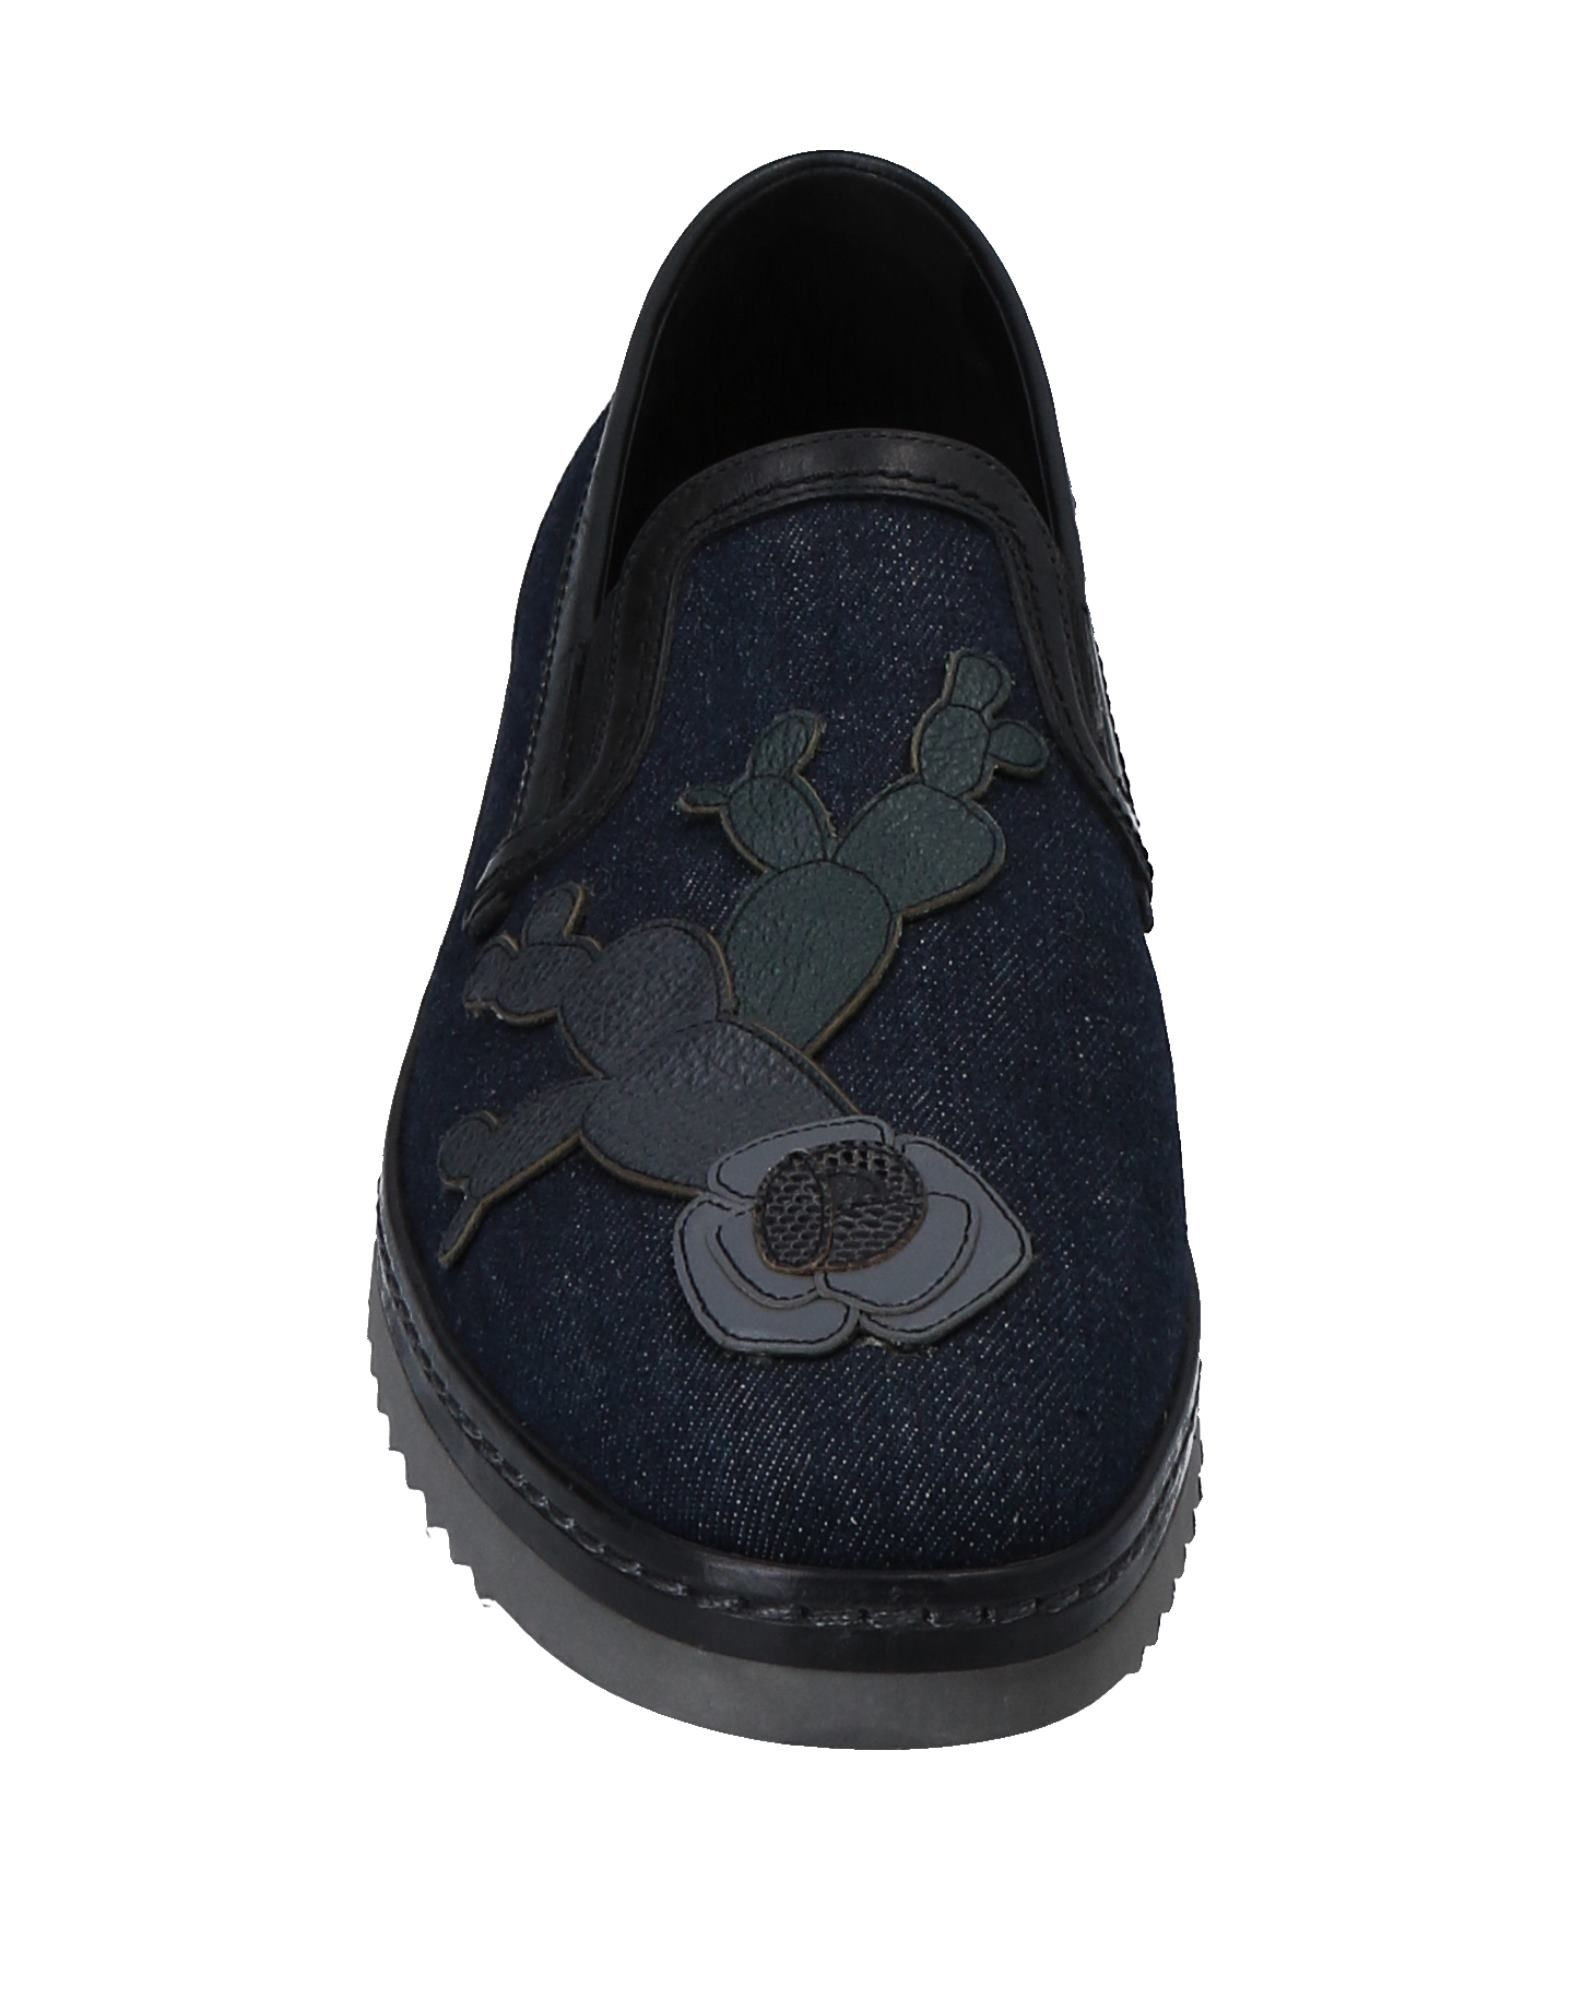 Dolce & Gabbana Sneakers Herren  11555021RT Gute Qualität beliebte Schuhe